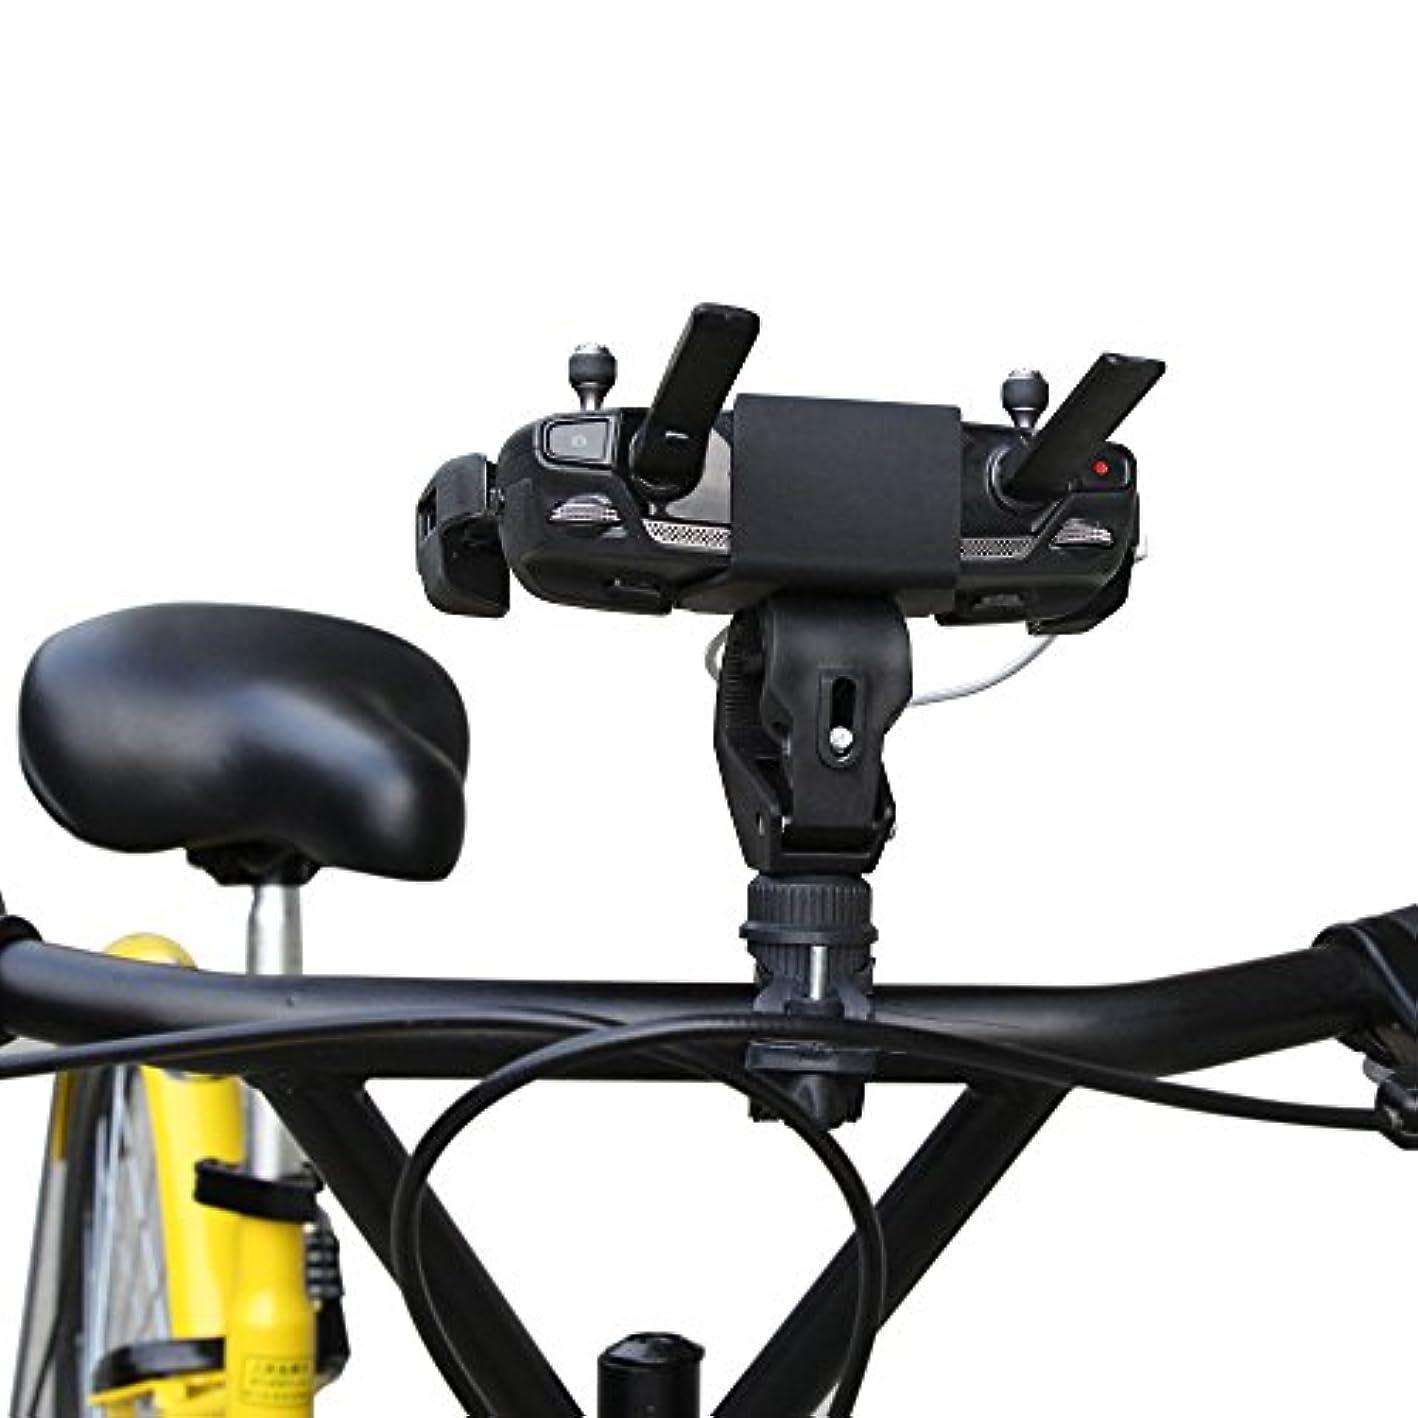 RCGEEK Bike Mount 360 Rotatable Bicycle Stand Rack Clamp Compatible DJI Mavic Pro Platinum Mavic Air Spark Remote Controller, Black